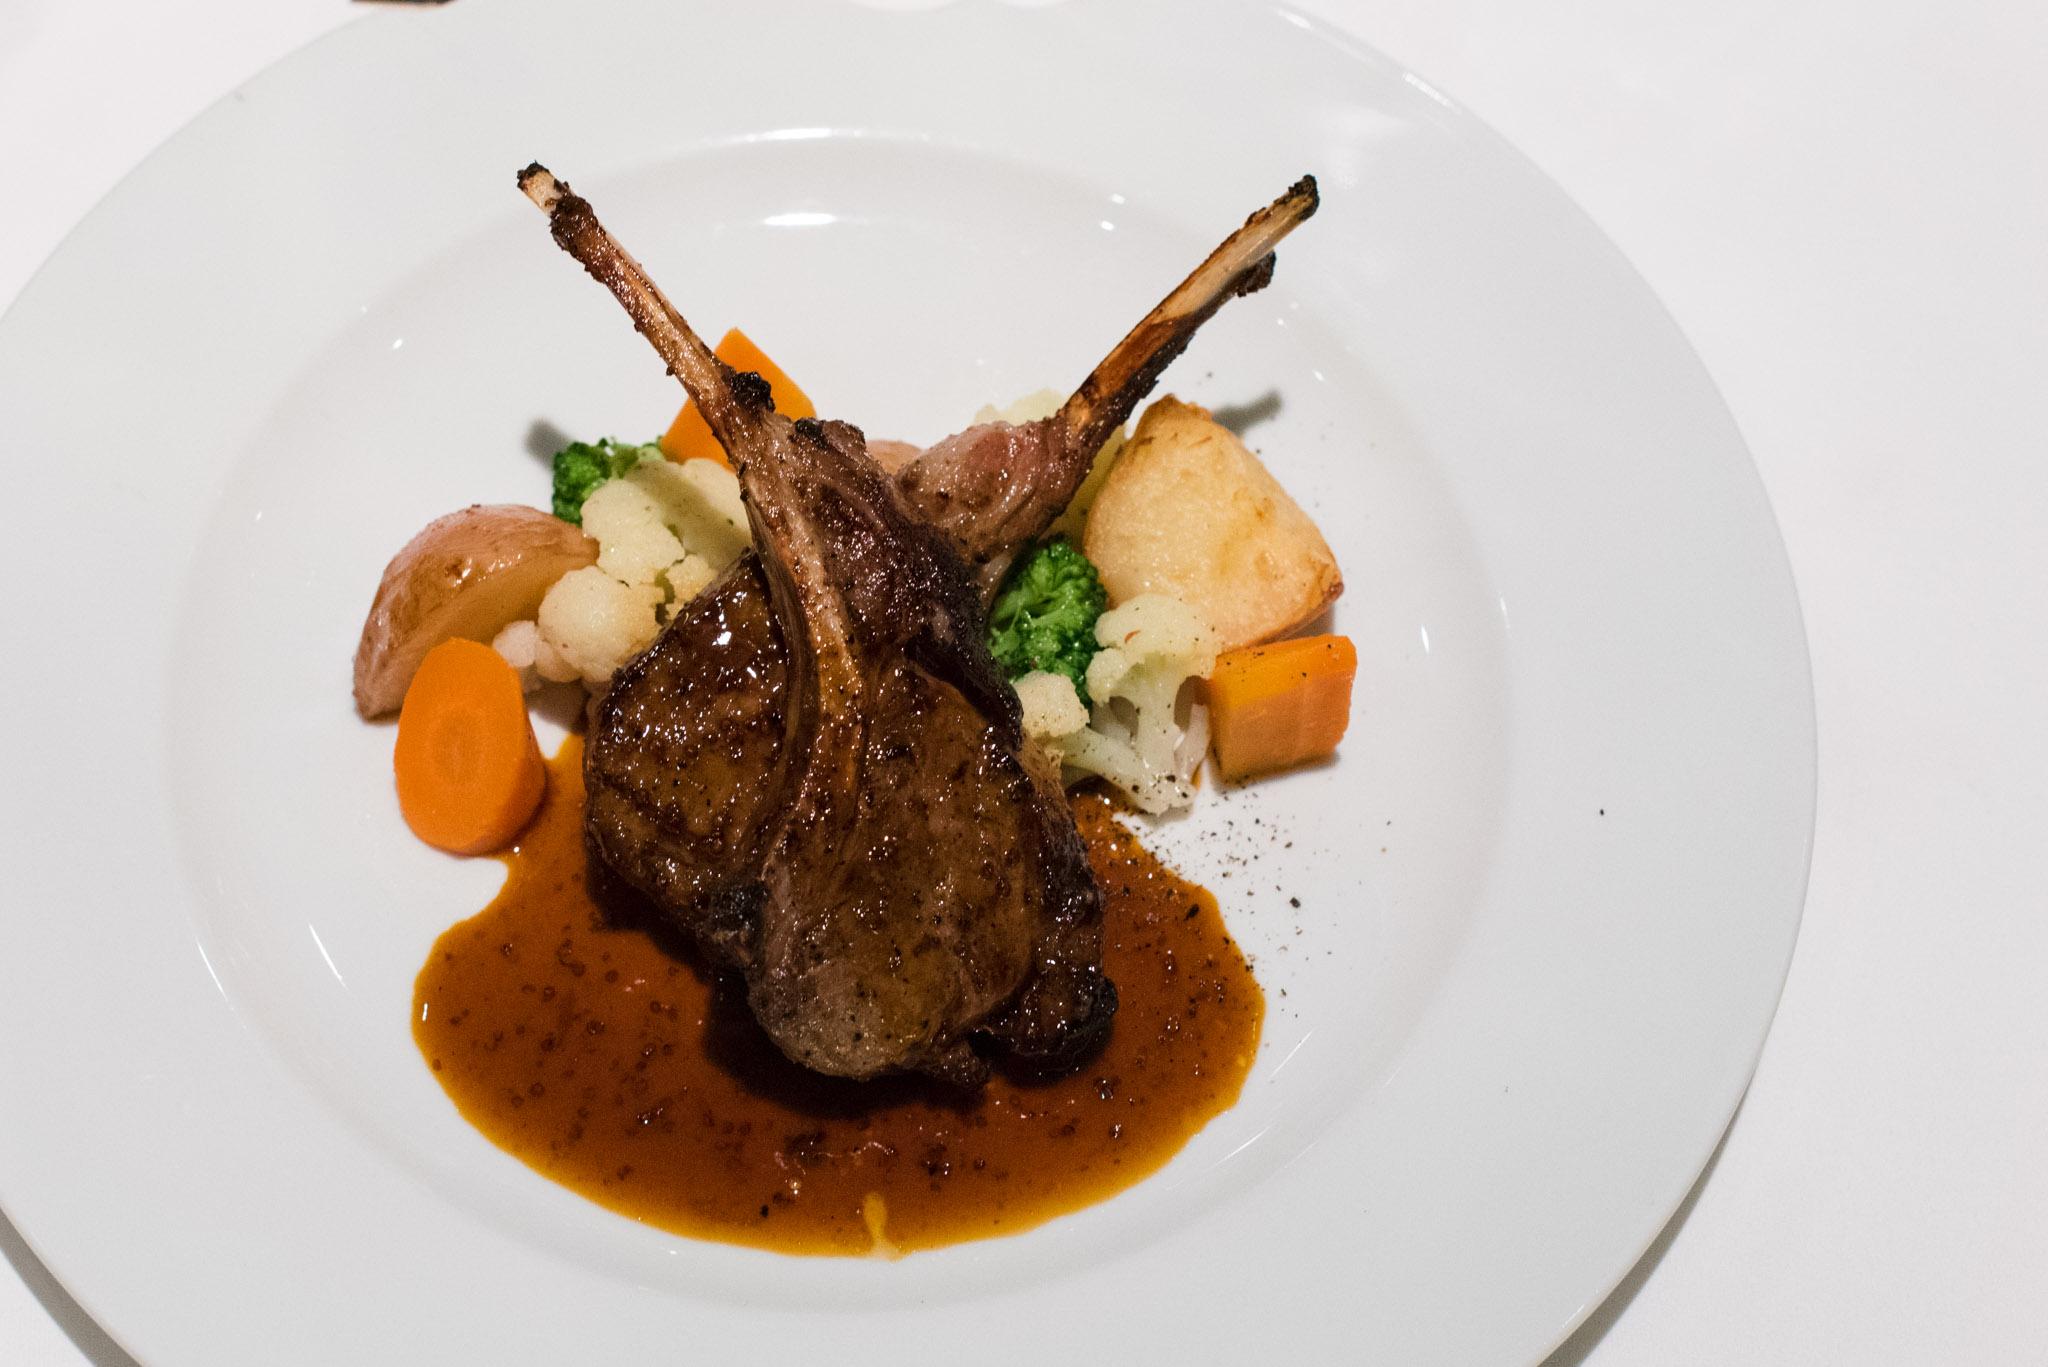 Lamb Chops  DOMVS, The Italian Restaurant - Sheraton Towers Singapore